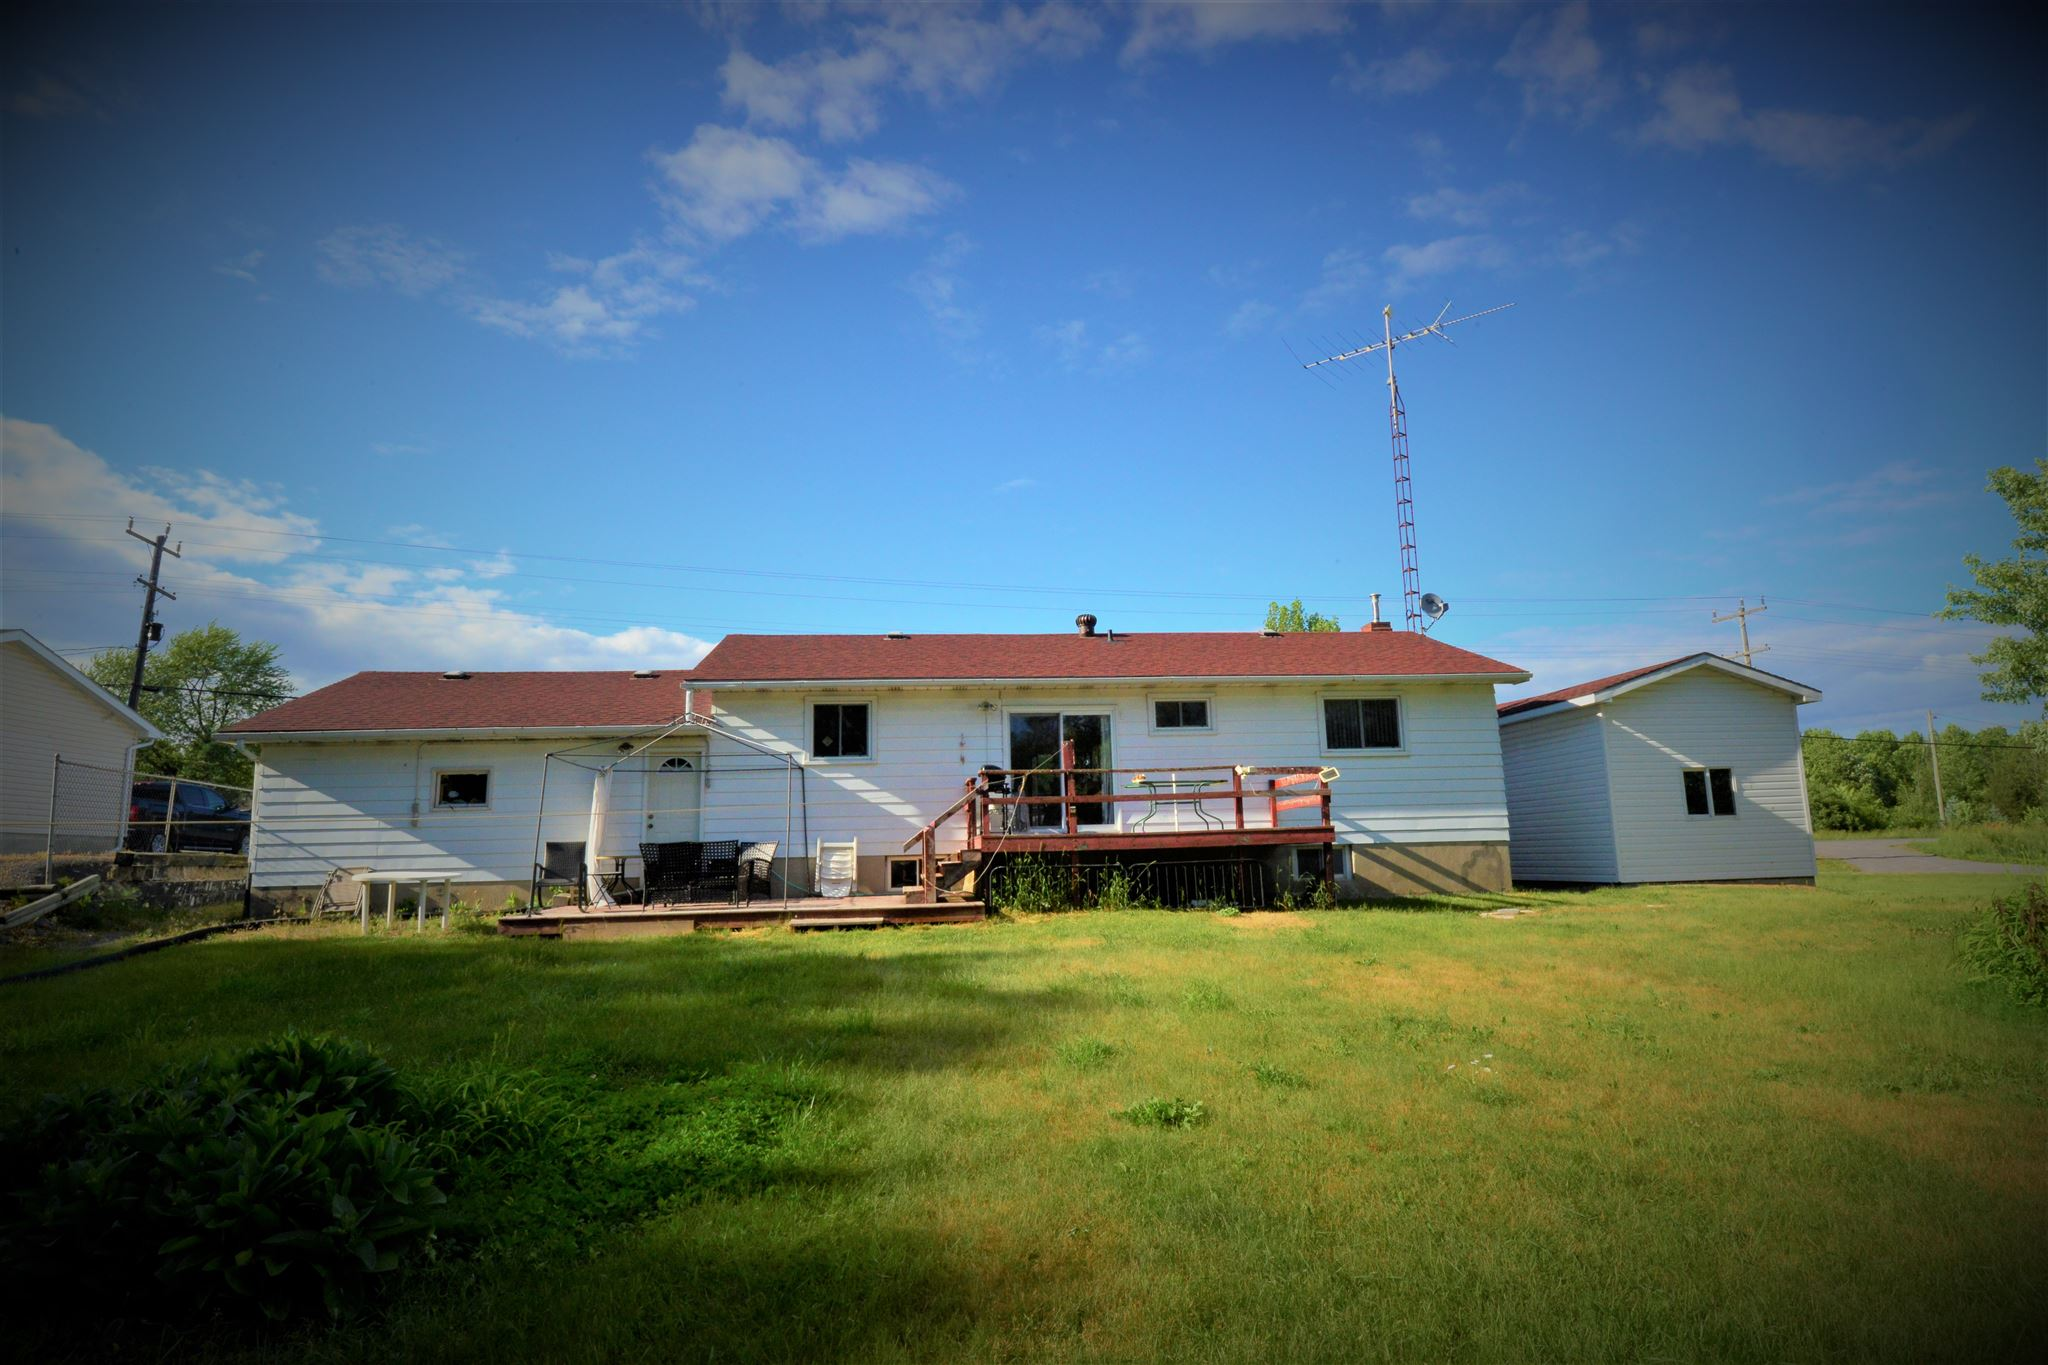 8034 County Road 2, Napanee, Ontario (ID K20003502)